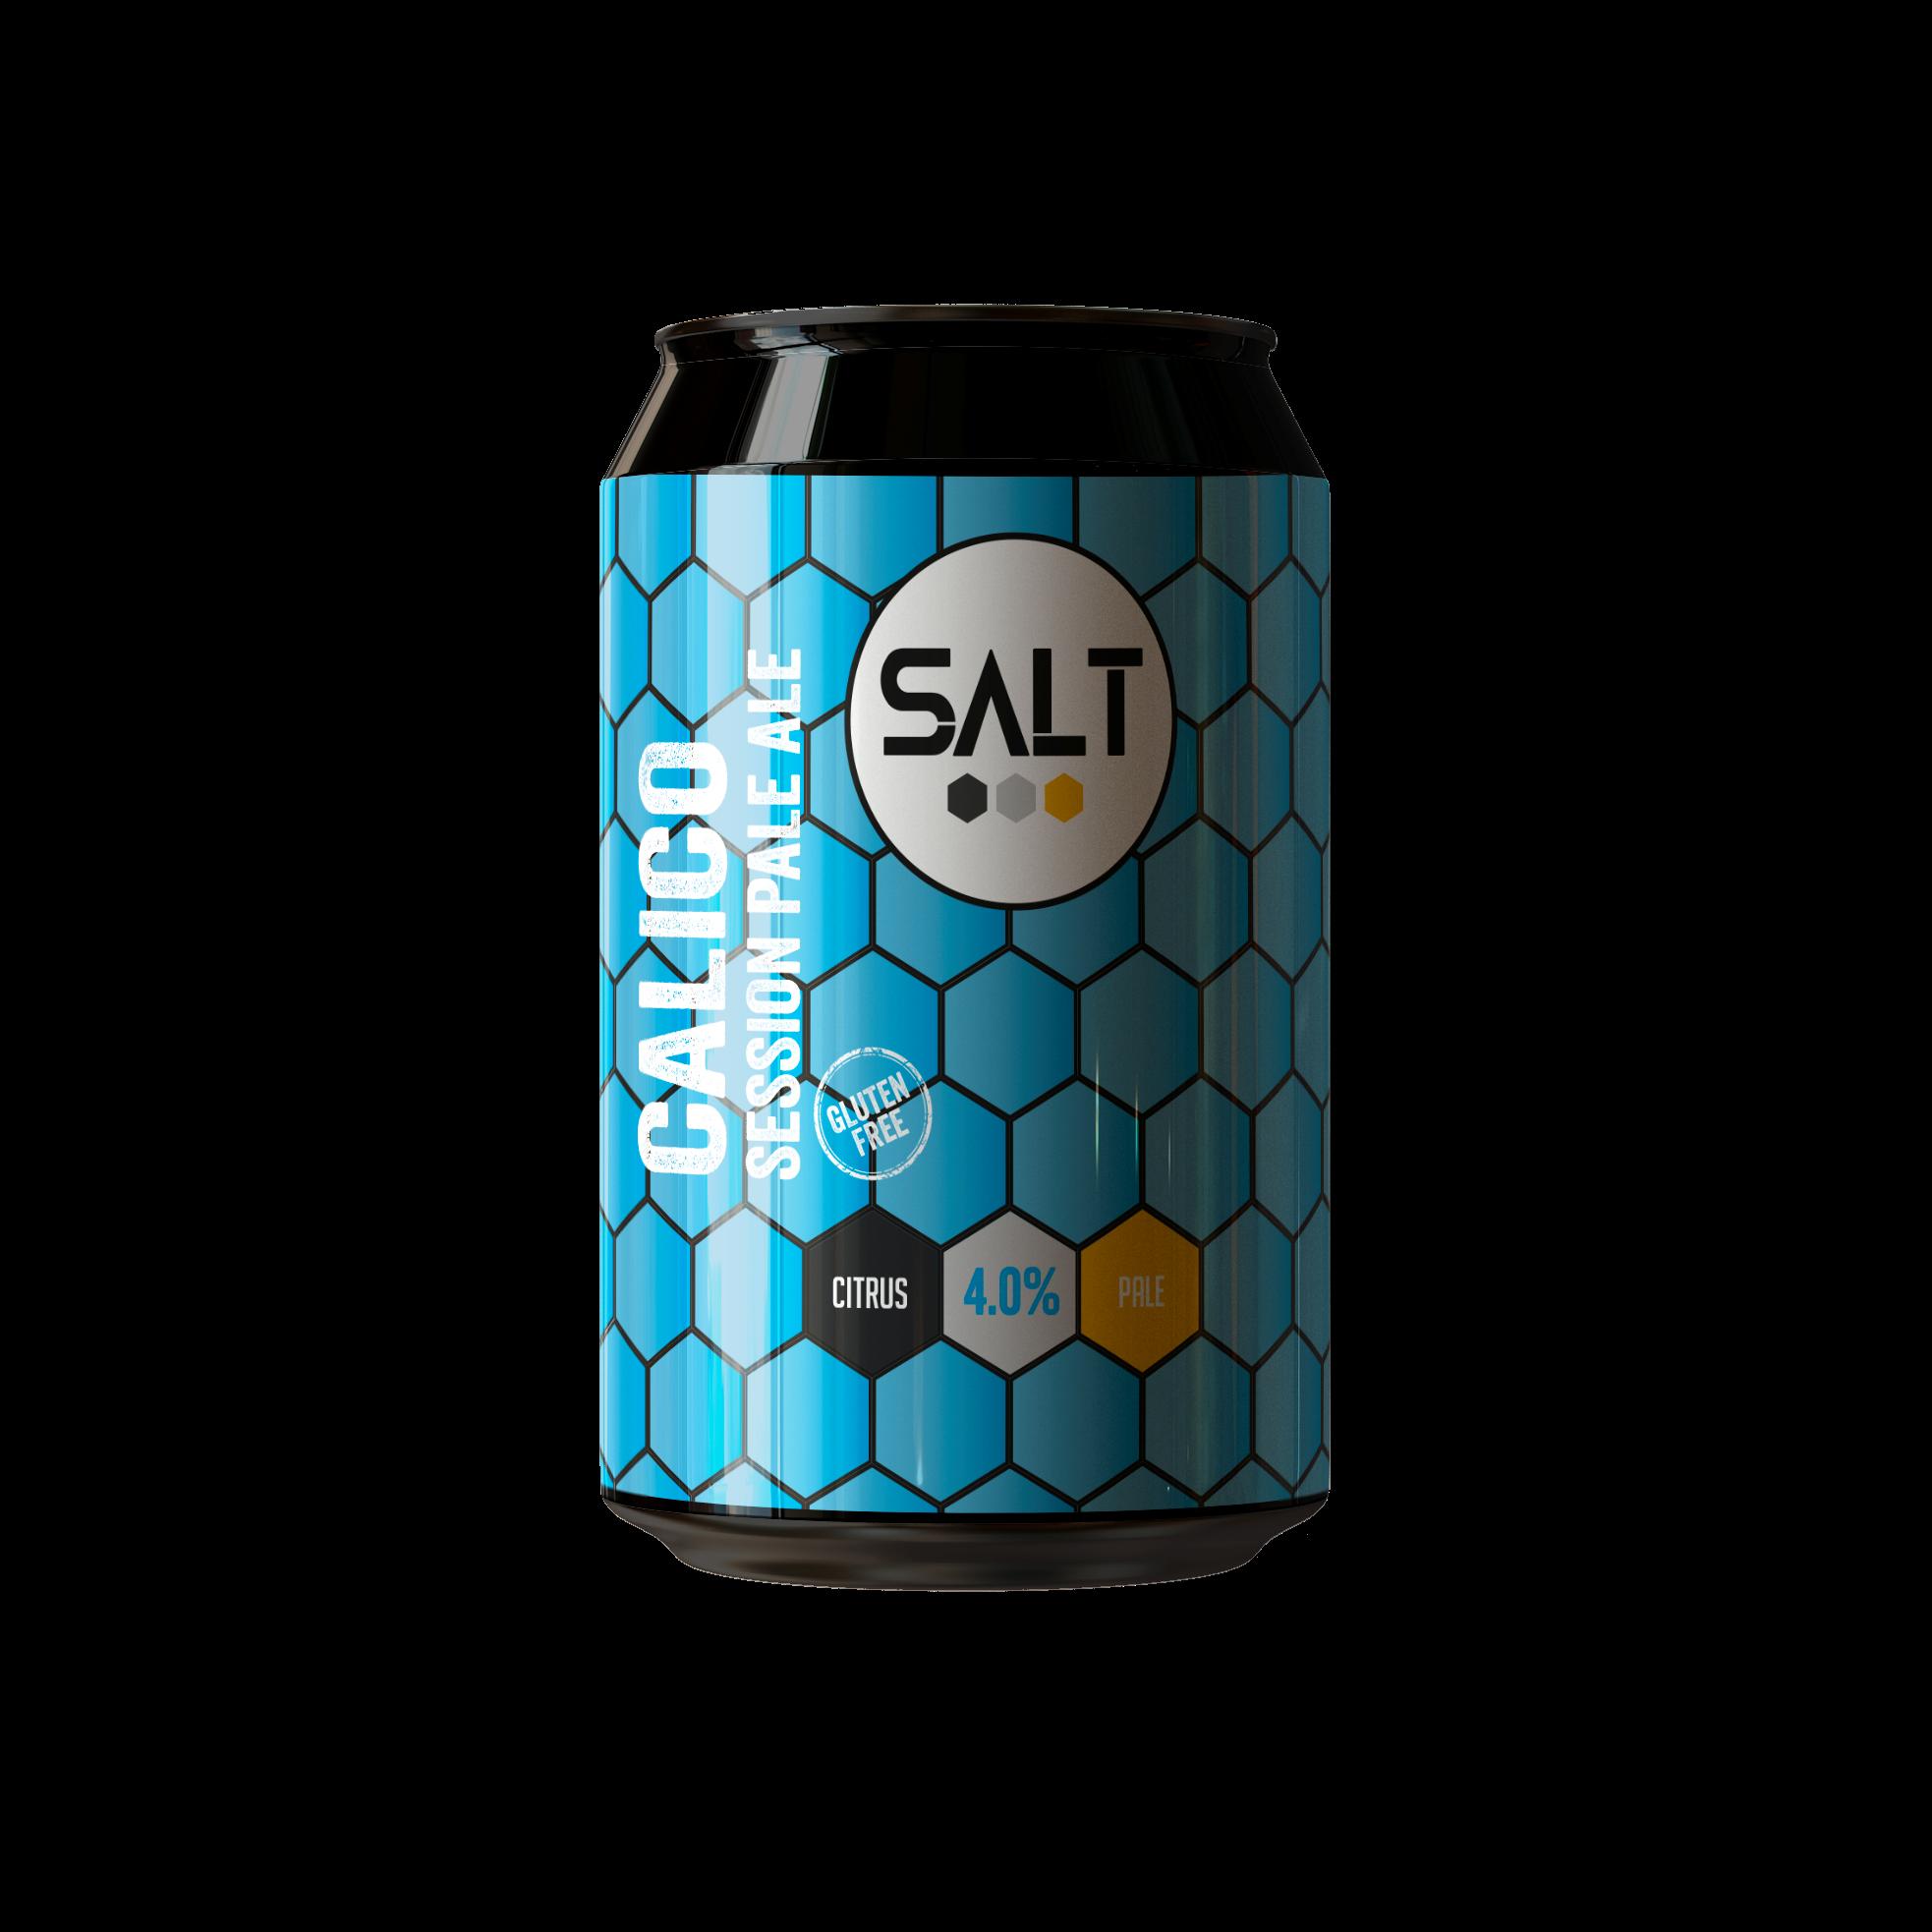 Salt | Calico | Gluten Free Session Pale Ale 4.0% 330ml